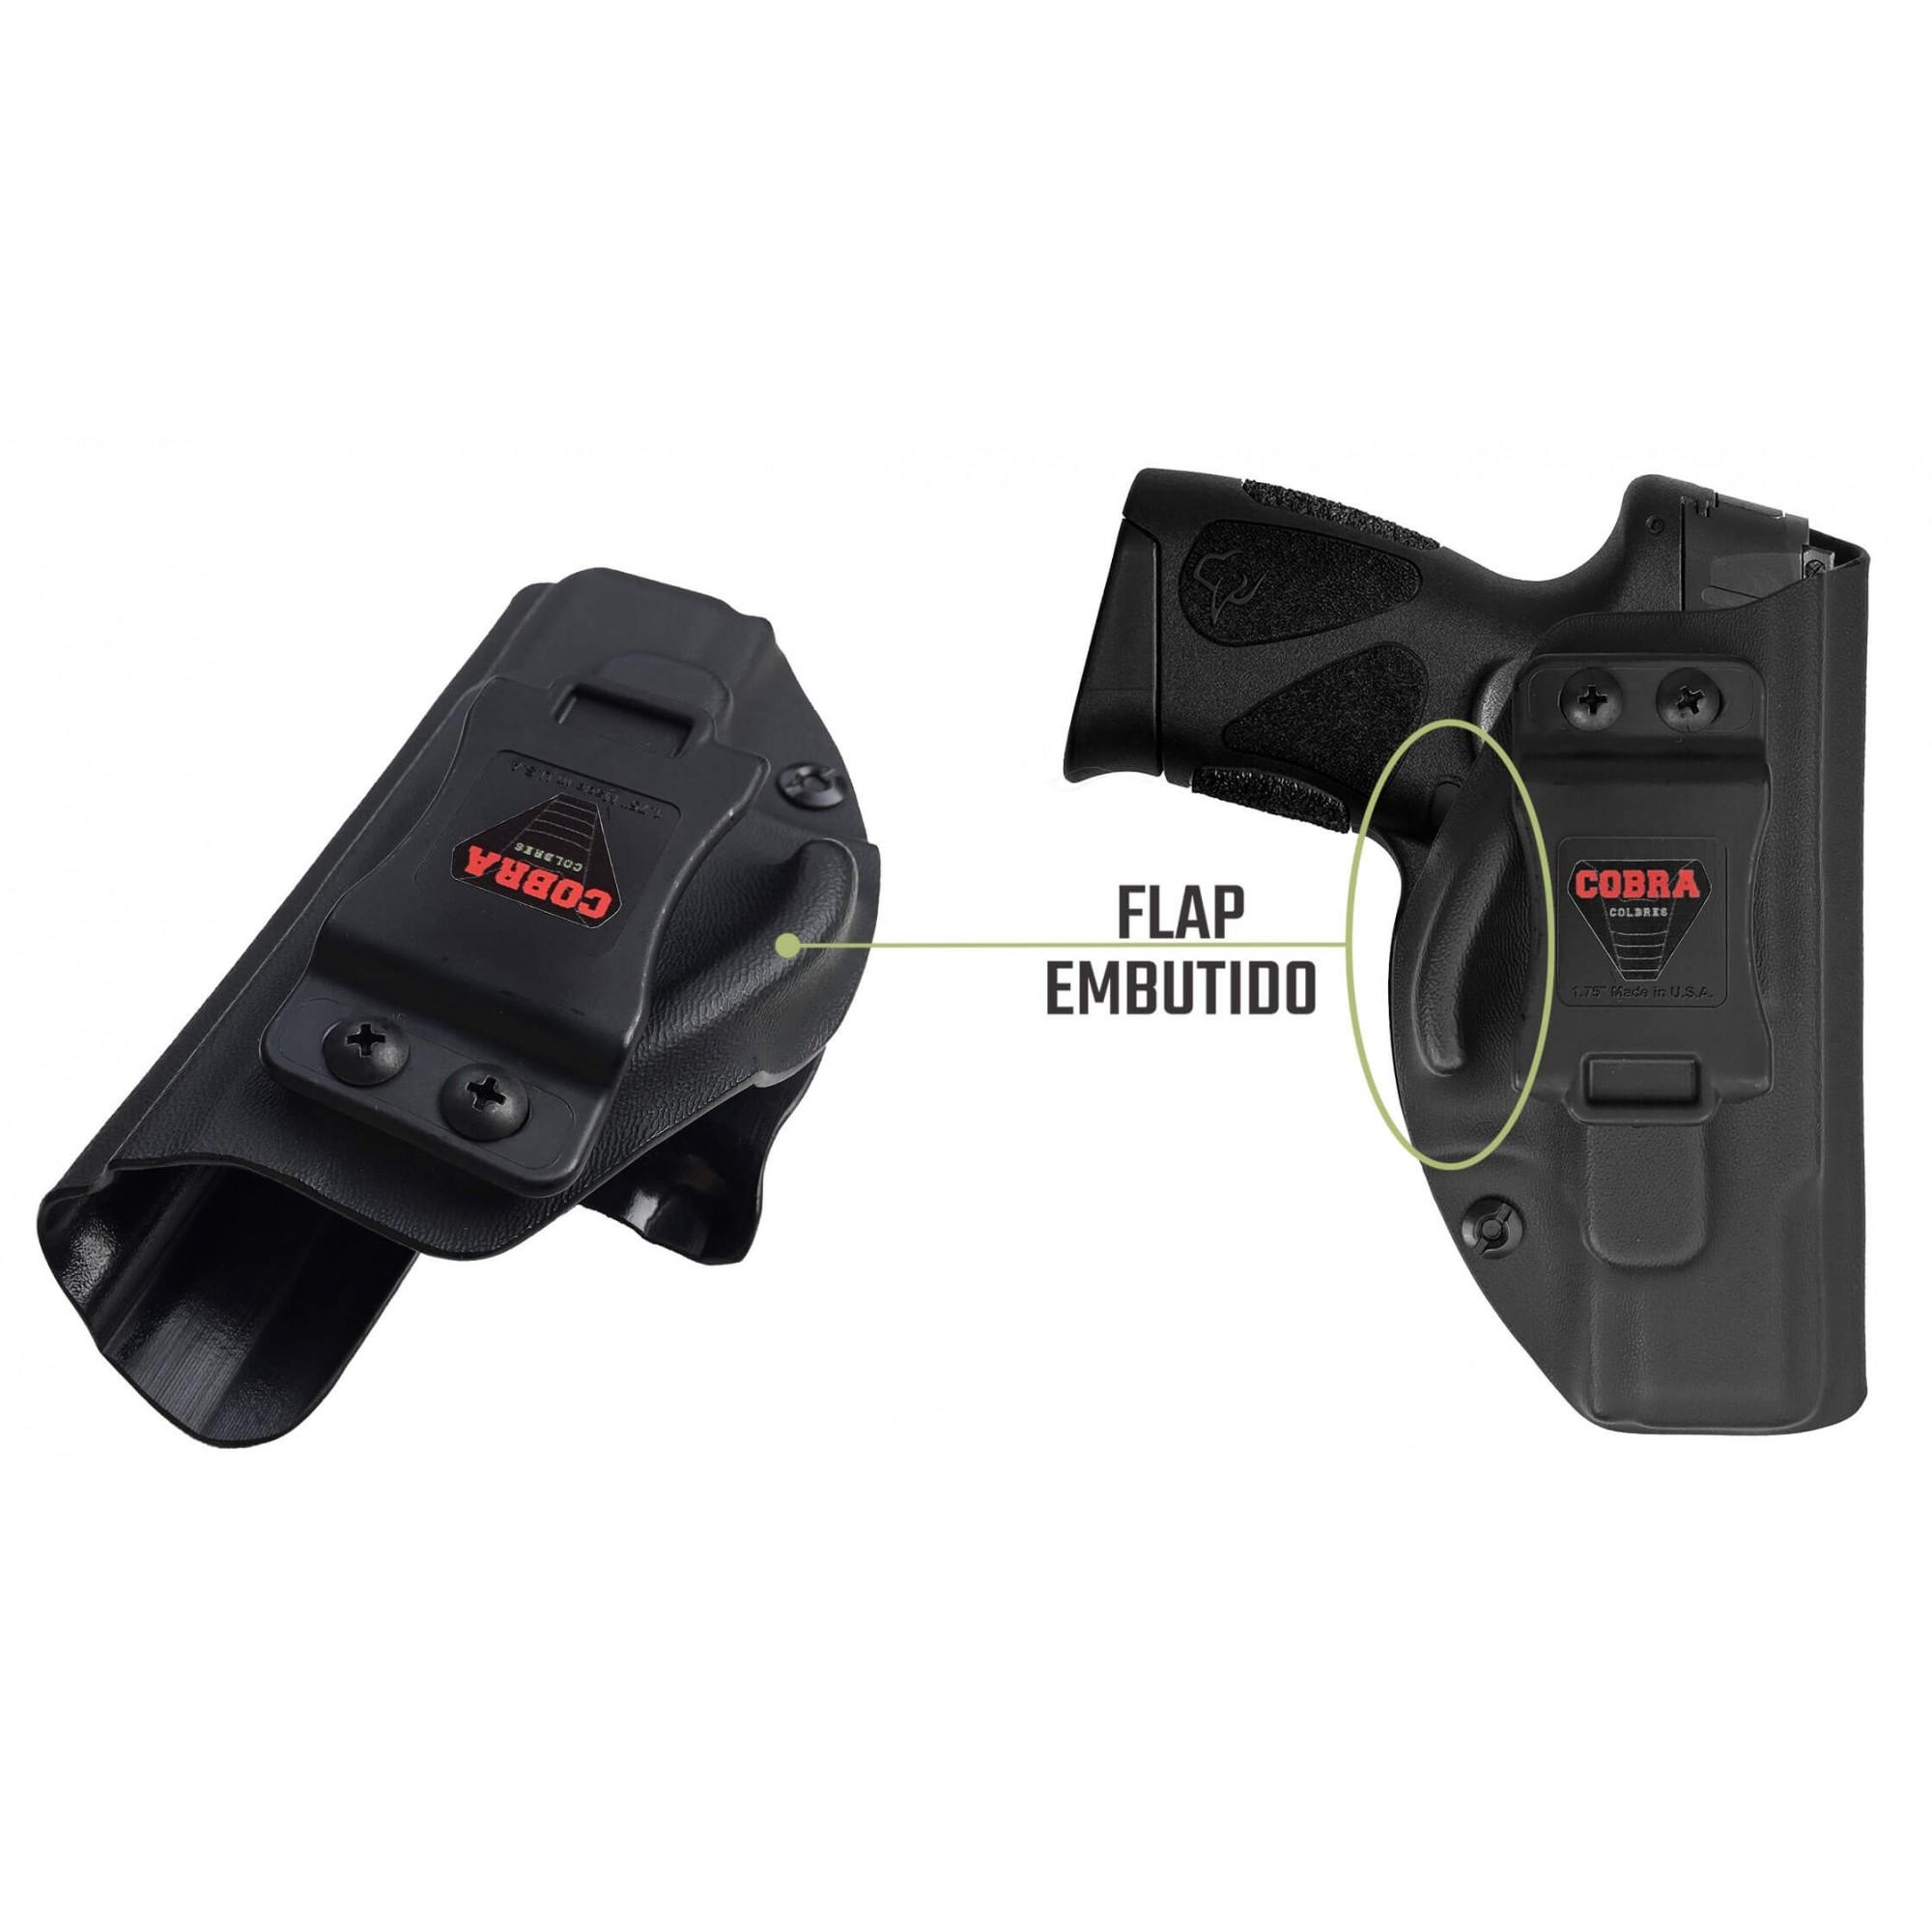 Coldre [G2c .40] Kydex Com Flap + Porta-Carregador - Saque Rápido Velado Kydex®